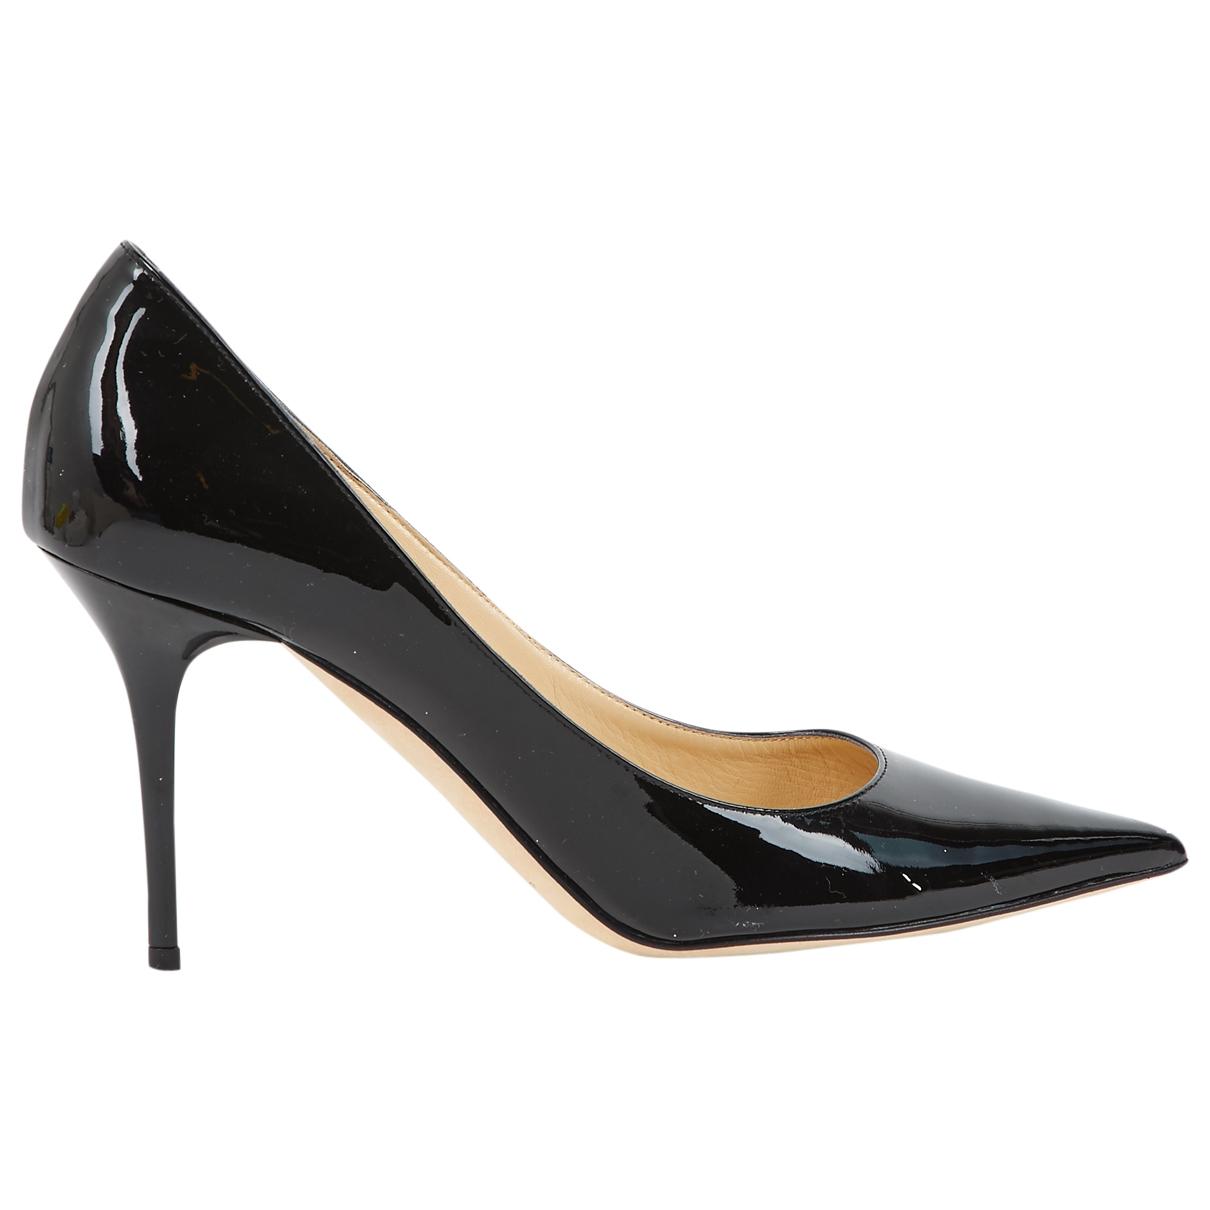 Jimmy Choo \N Black Patent leather Heels for Women 39 EU